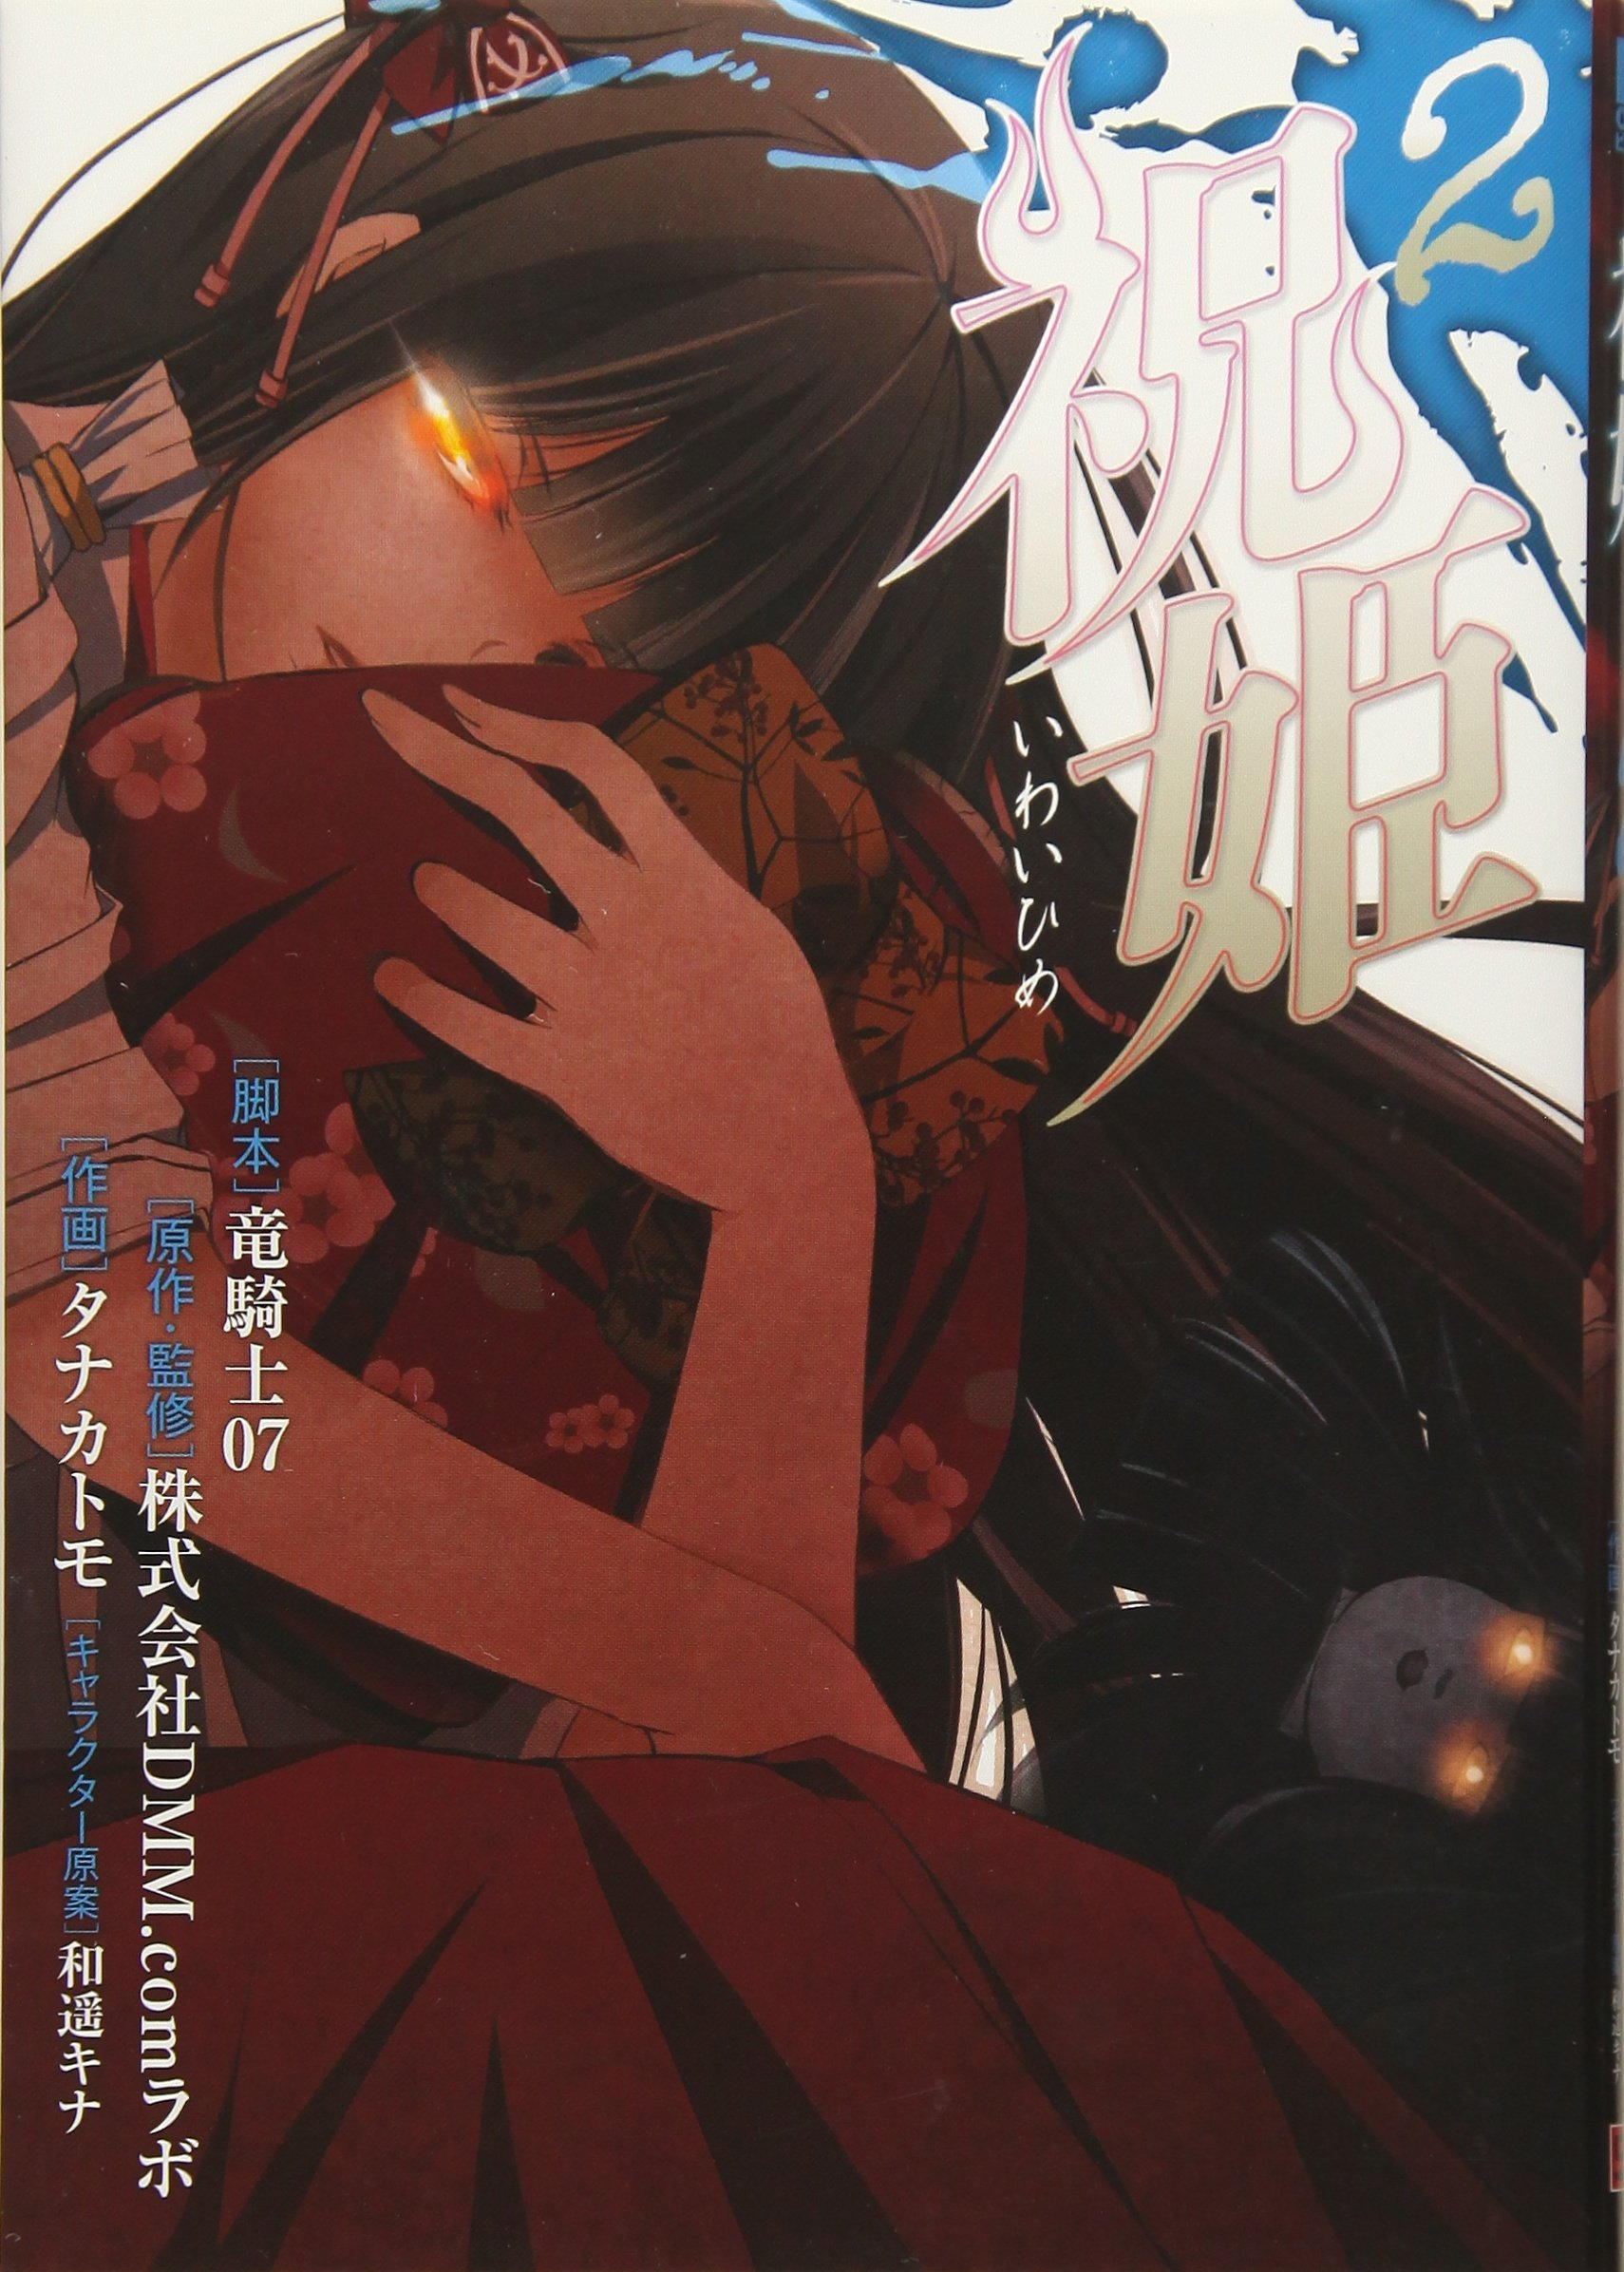 Iwaihime Volume 2